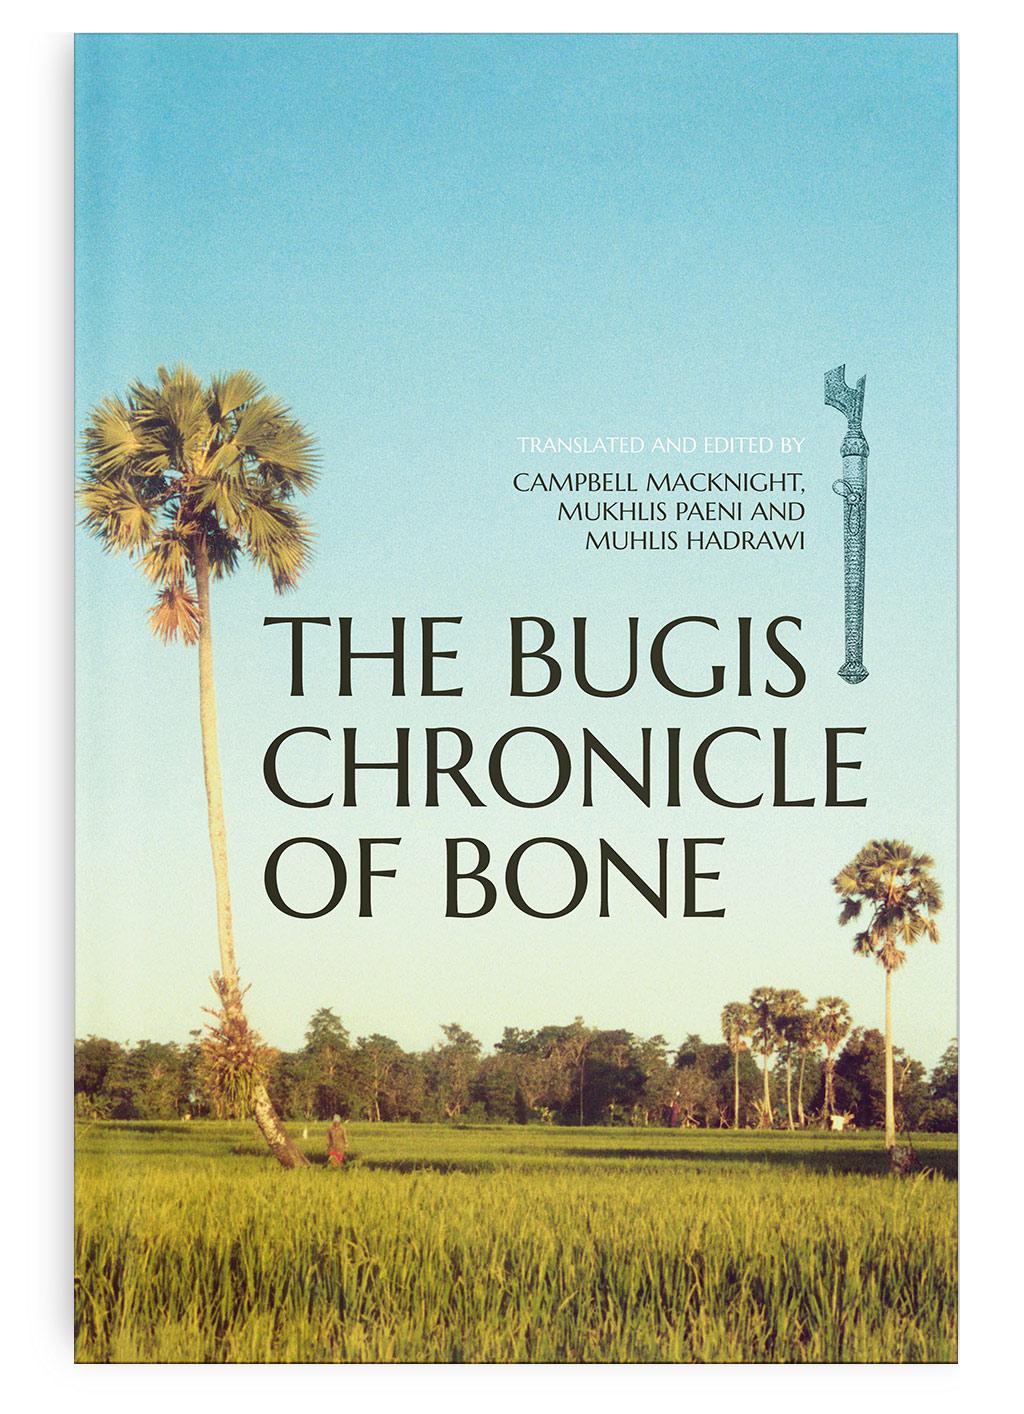 The Bugis Chronicle of Bone